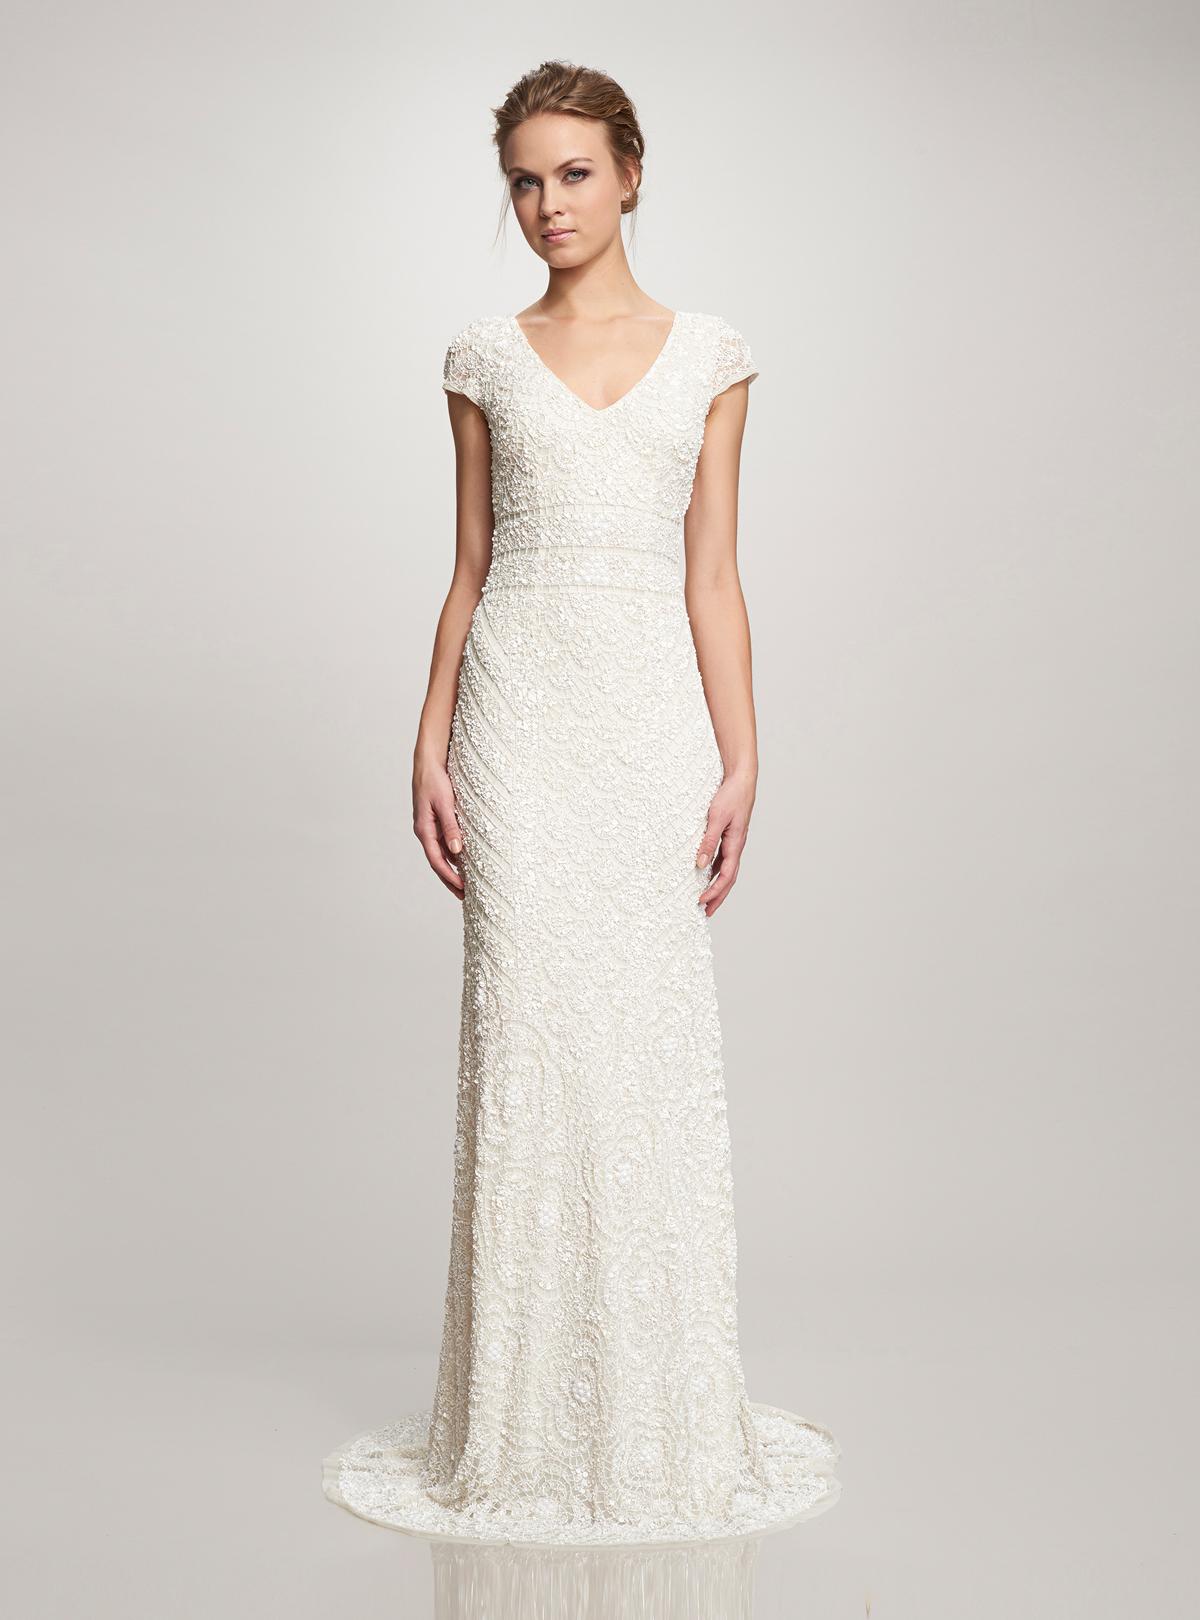 Theia Wedding Dresses Available At Blackburn Bridal